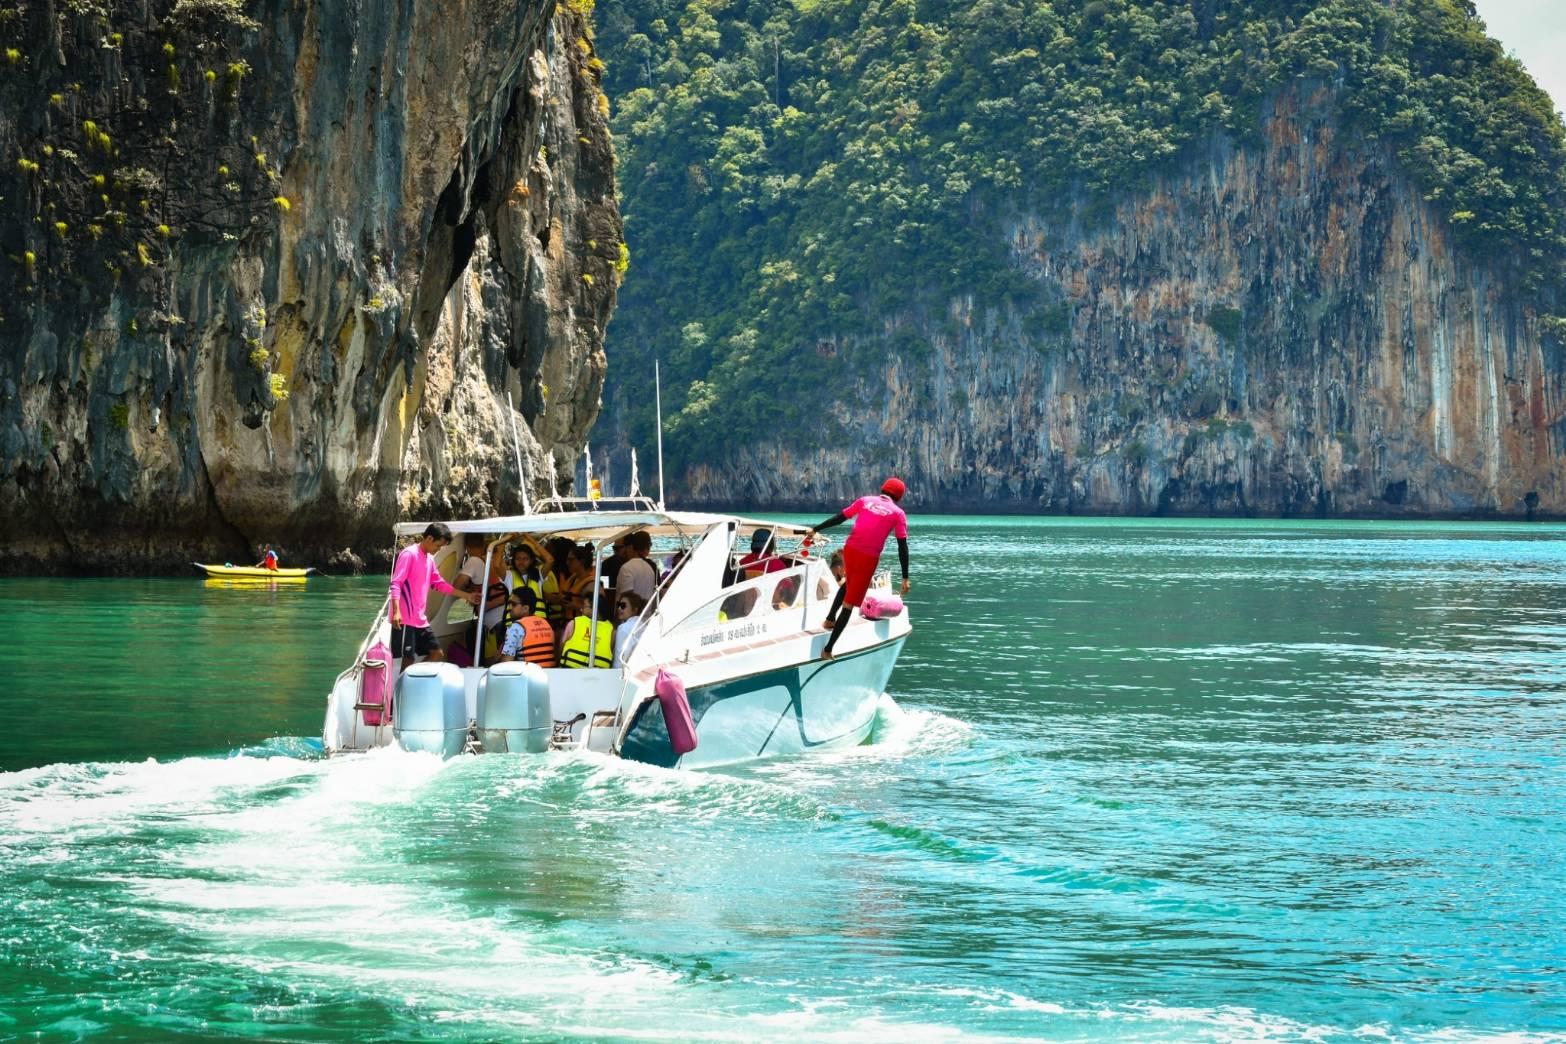 James Bond Island Speed Boat Qbic Travel Phuket Thailand